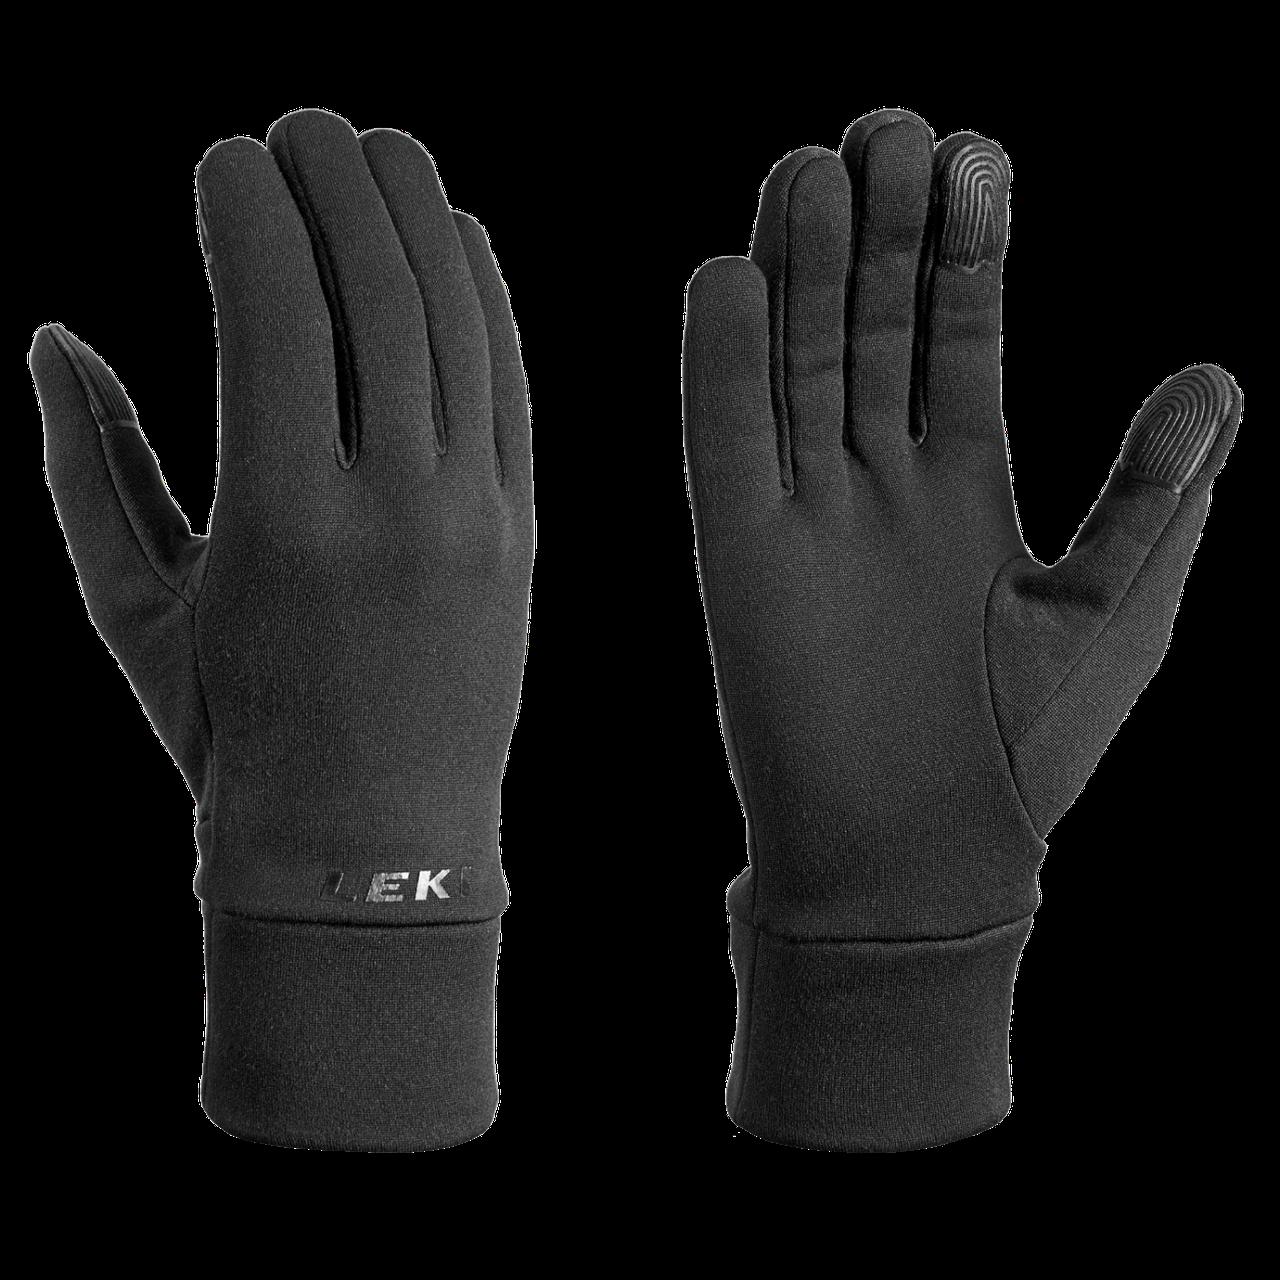 Перчатки LEKI Inner Glove mf touch